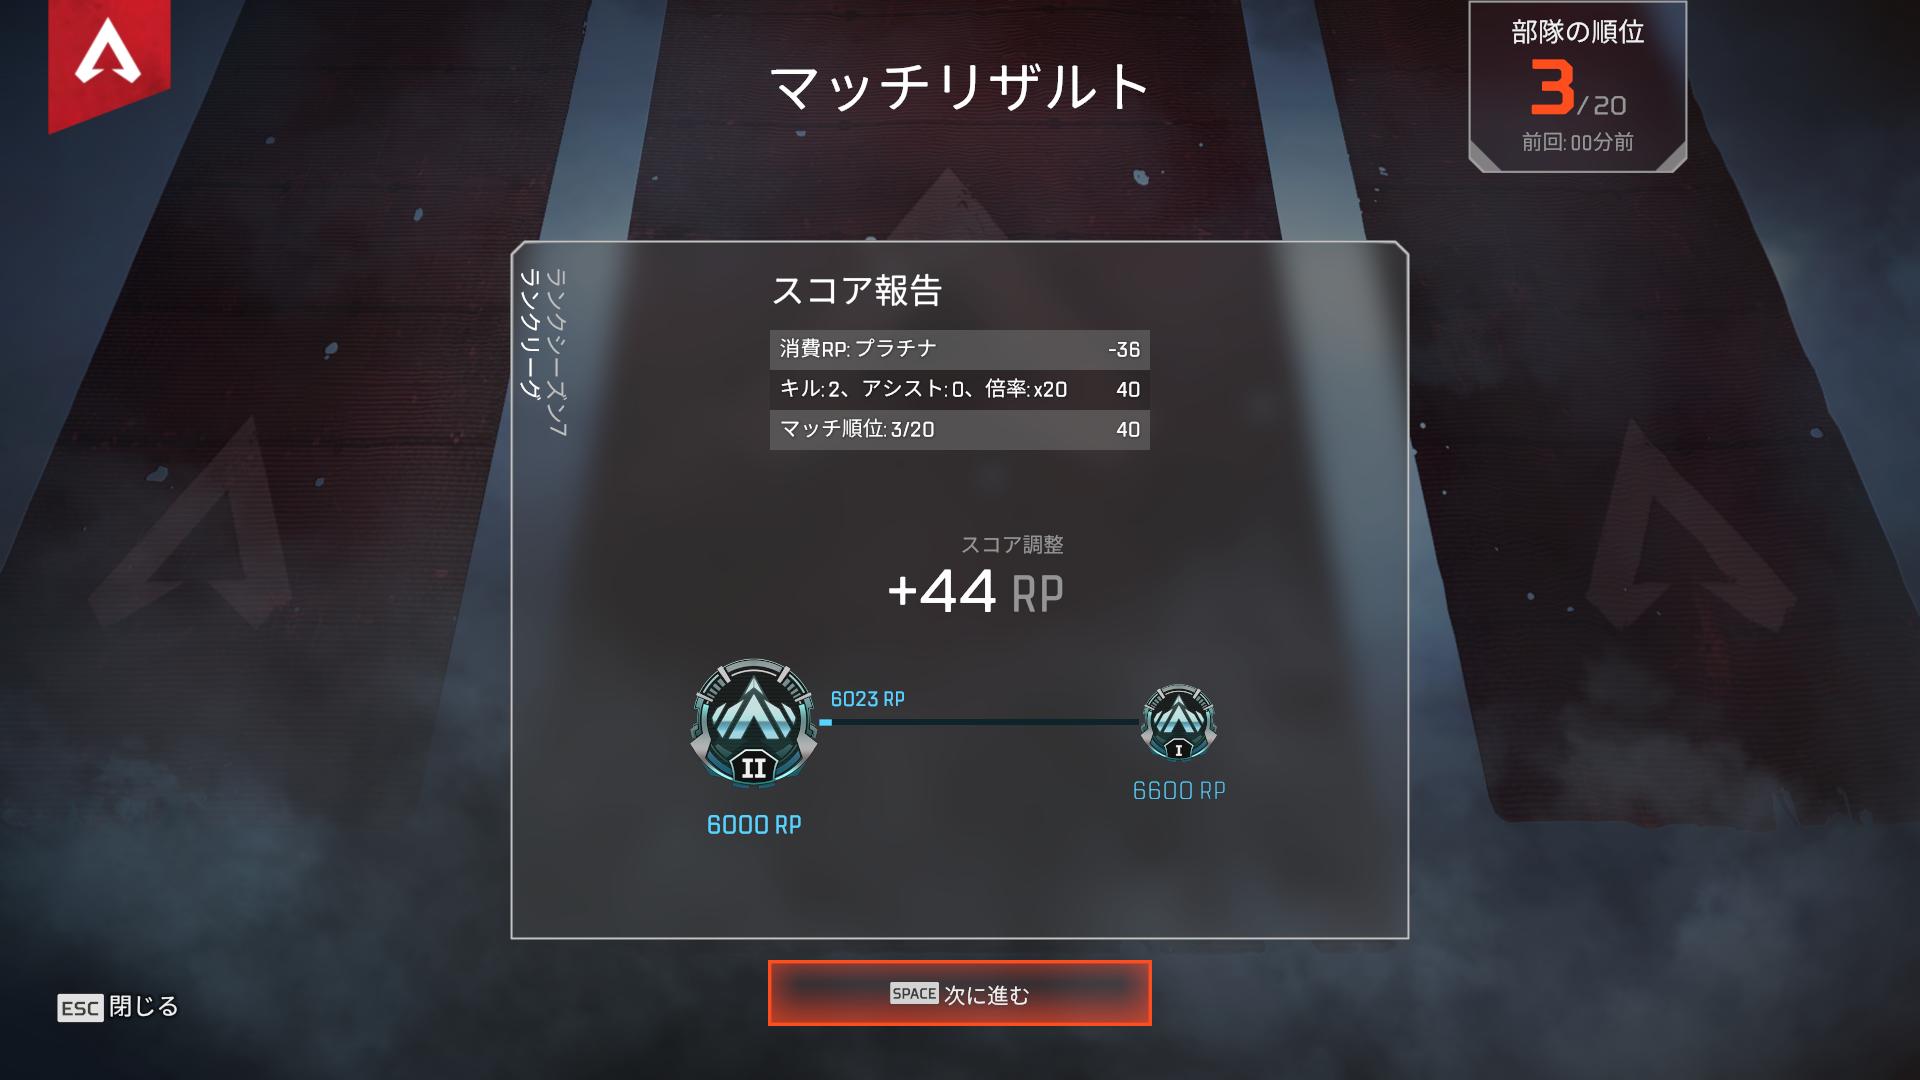 f:id:kyoumoe:20210202014823p:plain